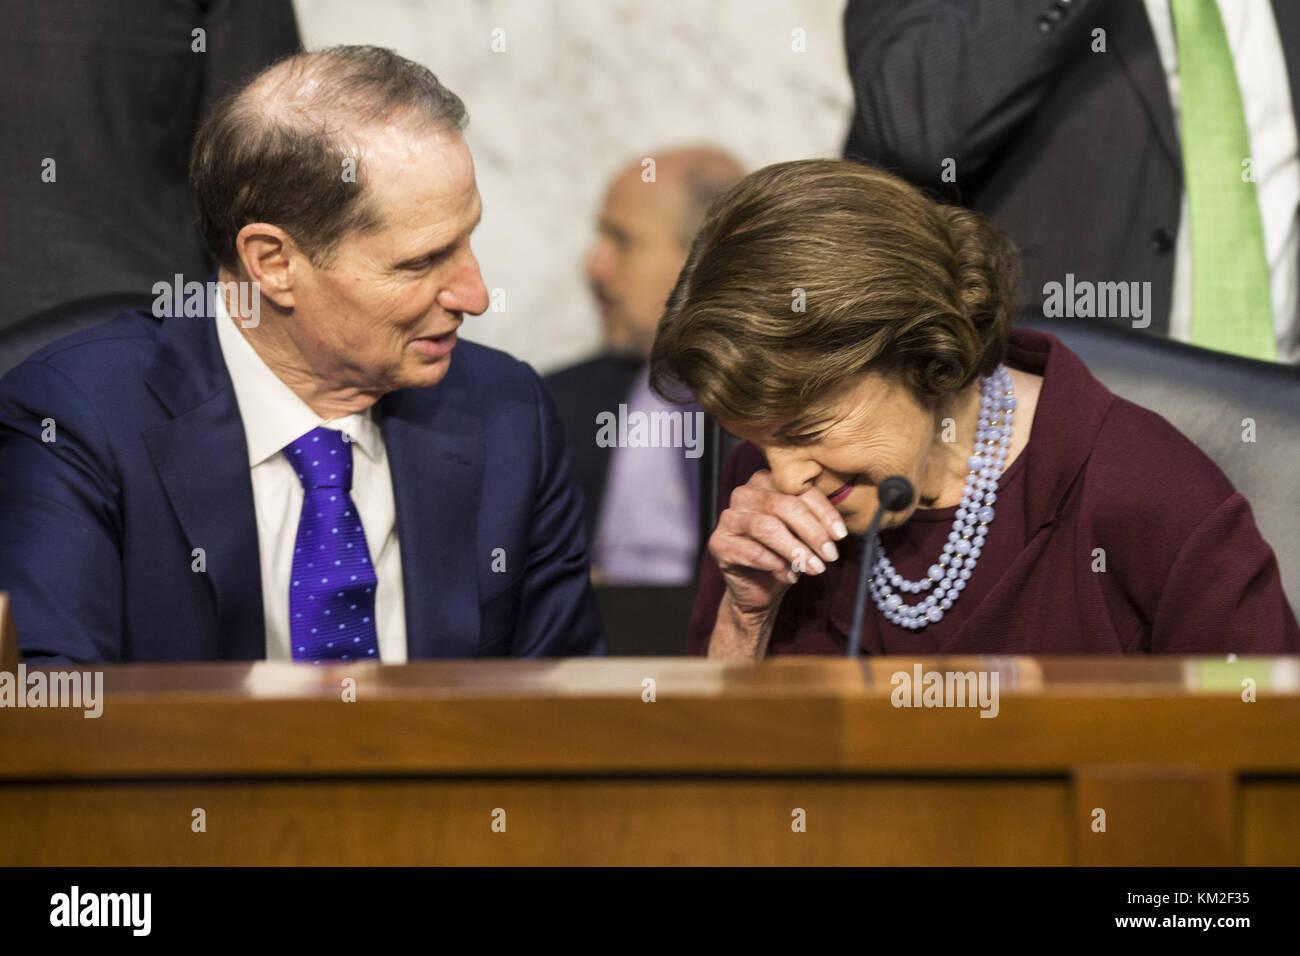 Washington, District Of Columbia, USA. 1st Nov, 2017. United States Senator DIANNE FEINSTEIN, Democrat of California, - Stock Image